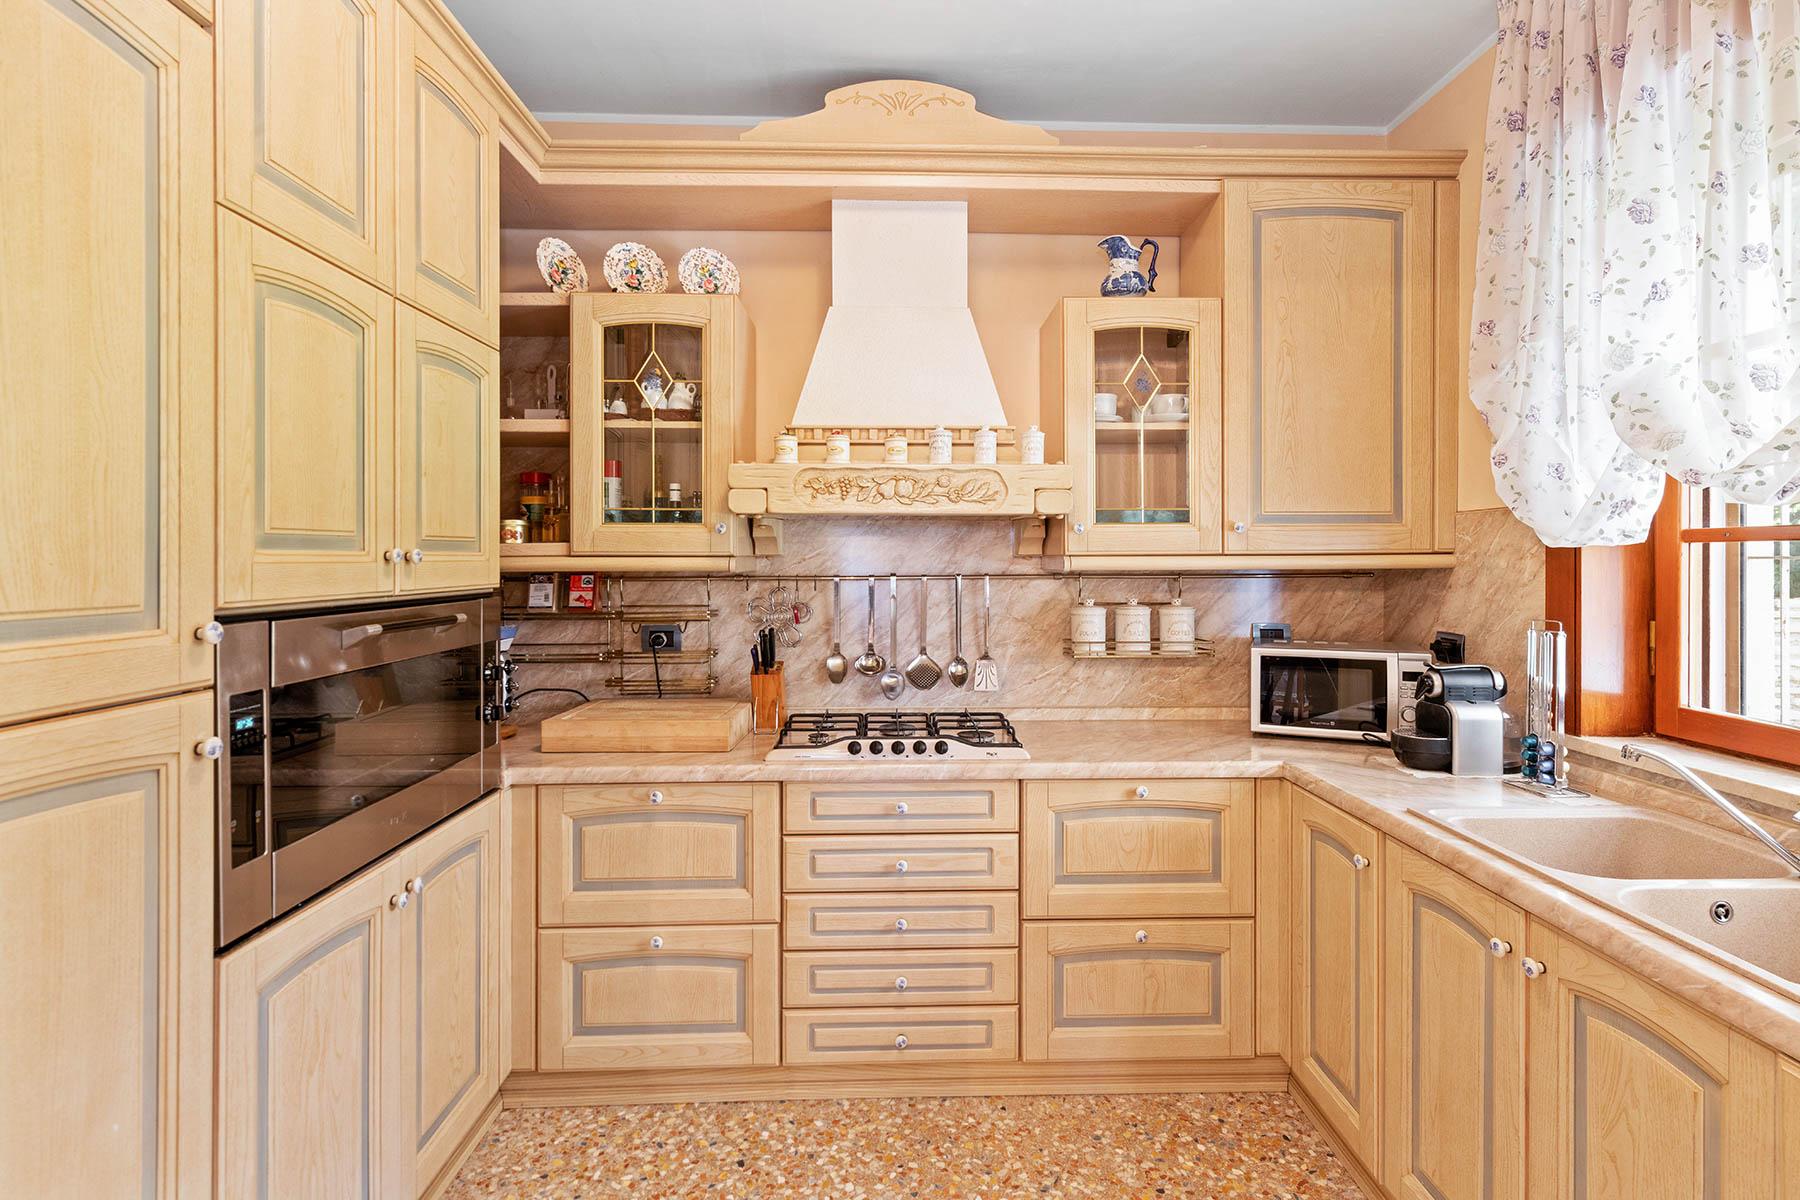 Villa in Vendita a Sirmione: 5 locali, 500 mq - Foto 14